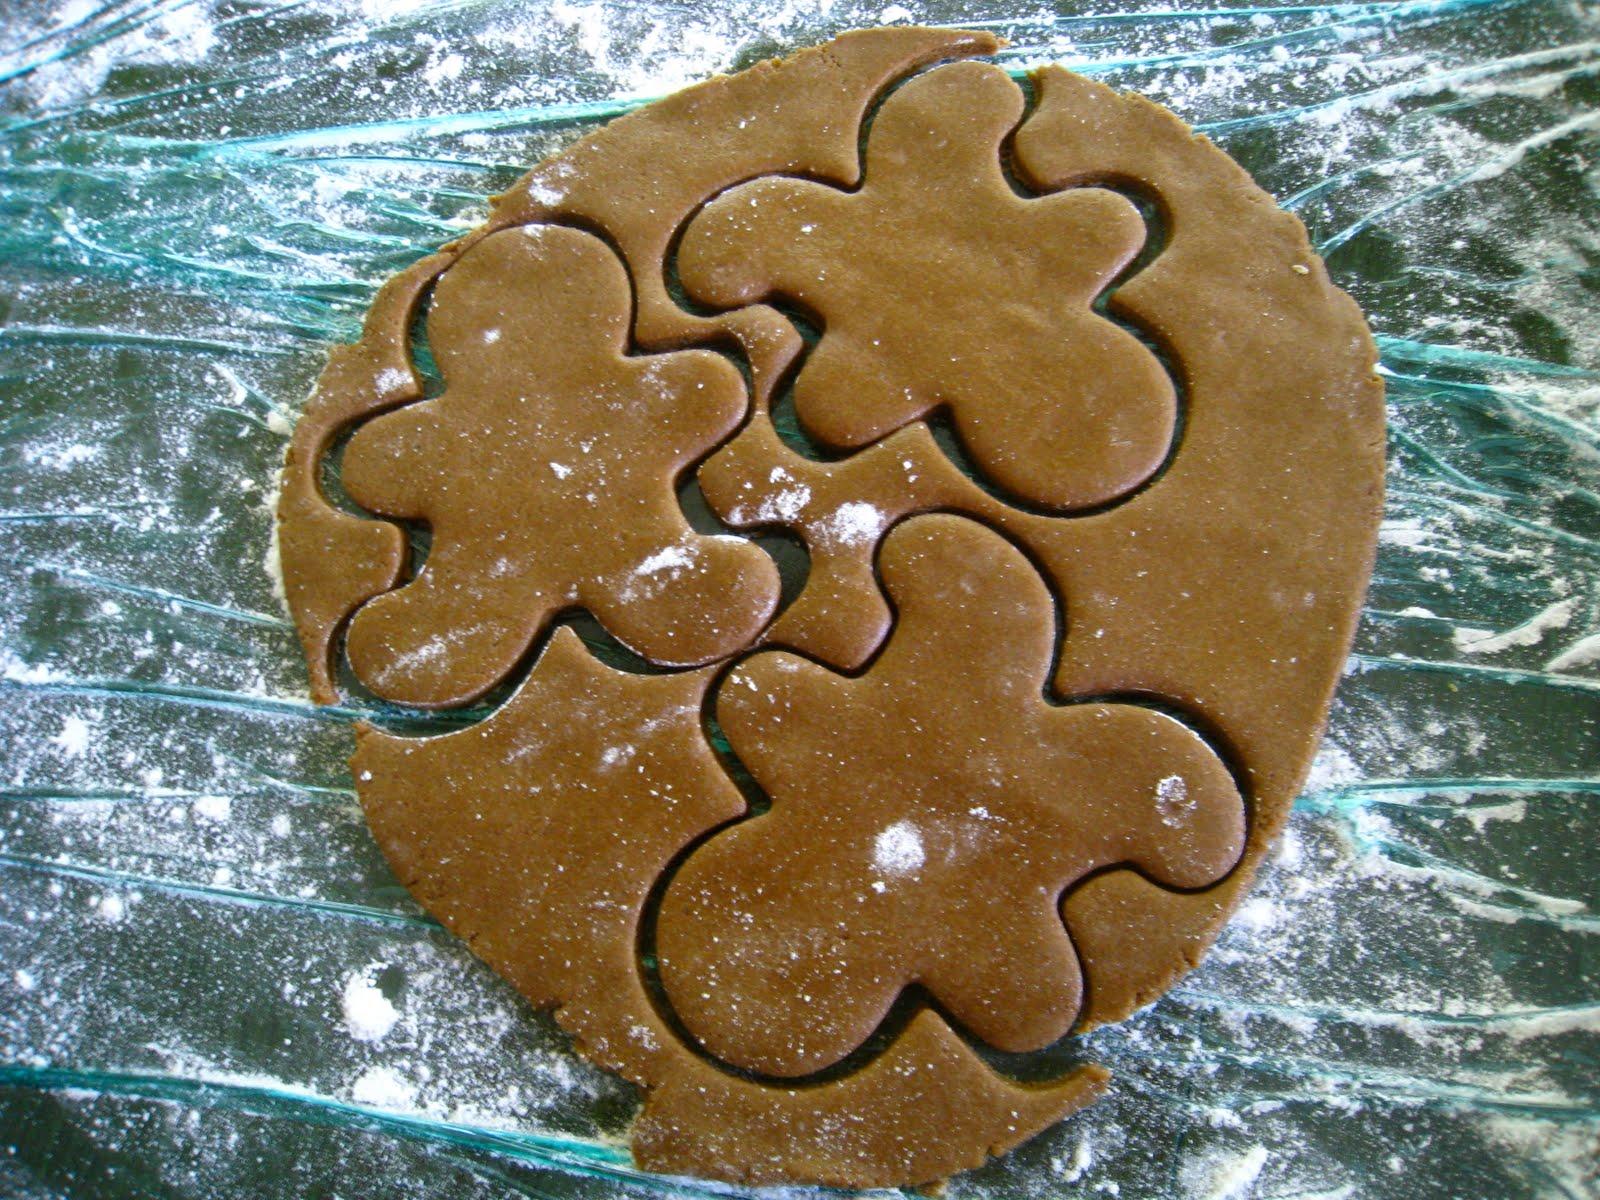 Mutritious Nuffins: Gluten Free Gingerbread Men